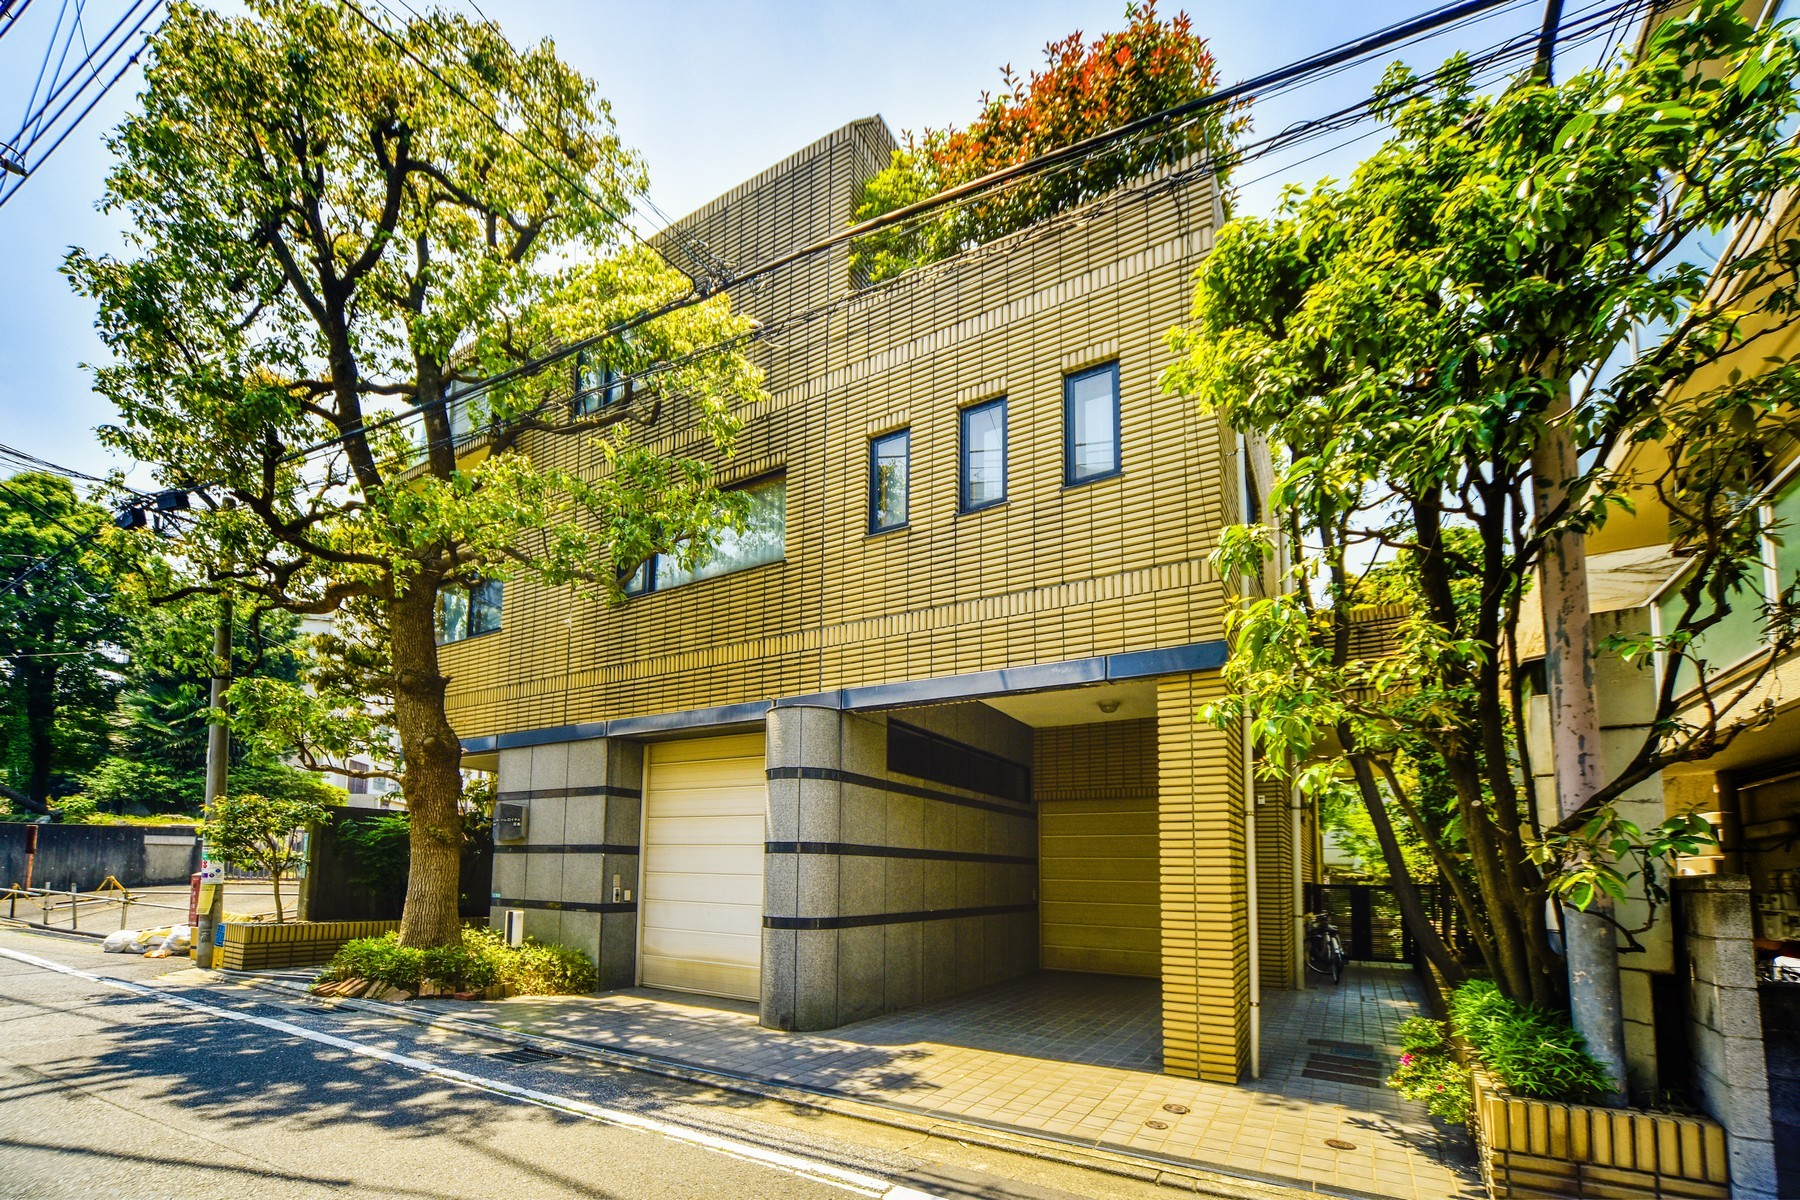 Appartamento per Vendita alle ore Halle Royal Meguro Meguro, Meguro-Ku, Tokyo Giappone